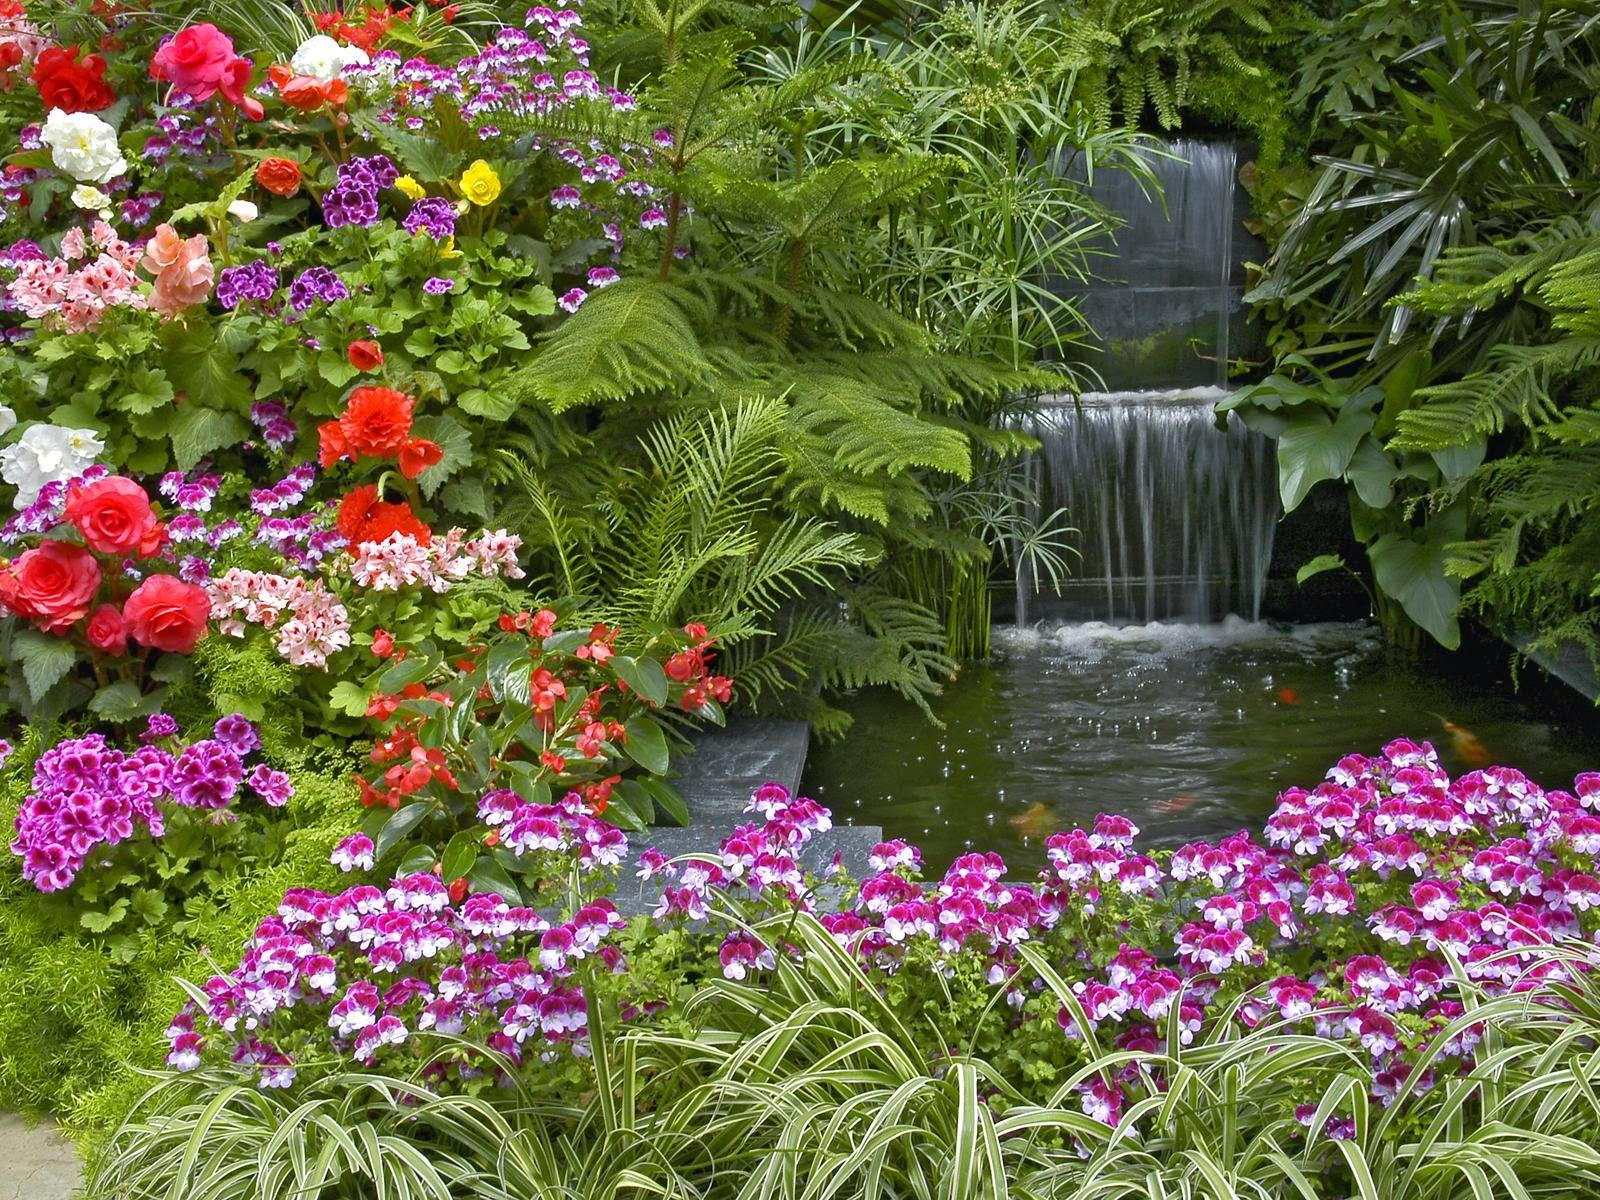 HD Flower Garden Wallpaperhttprefreshroseblogspotcom 1600x1200